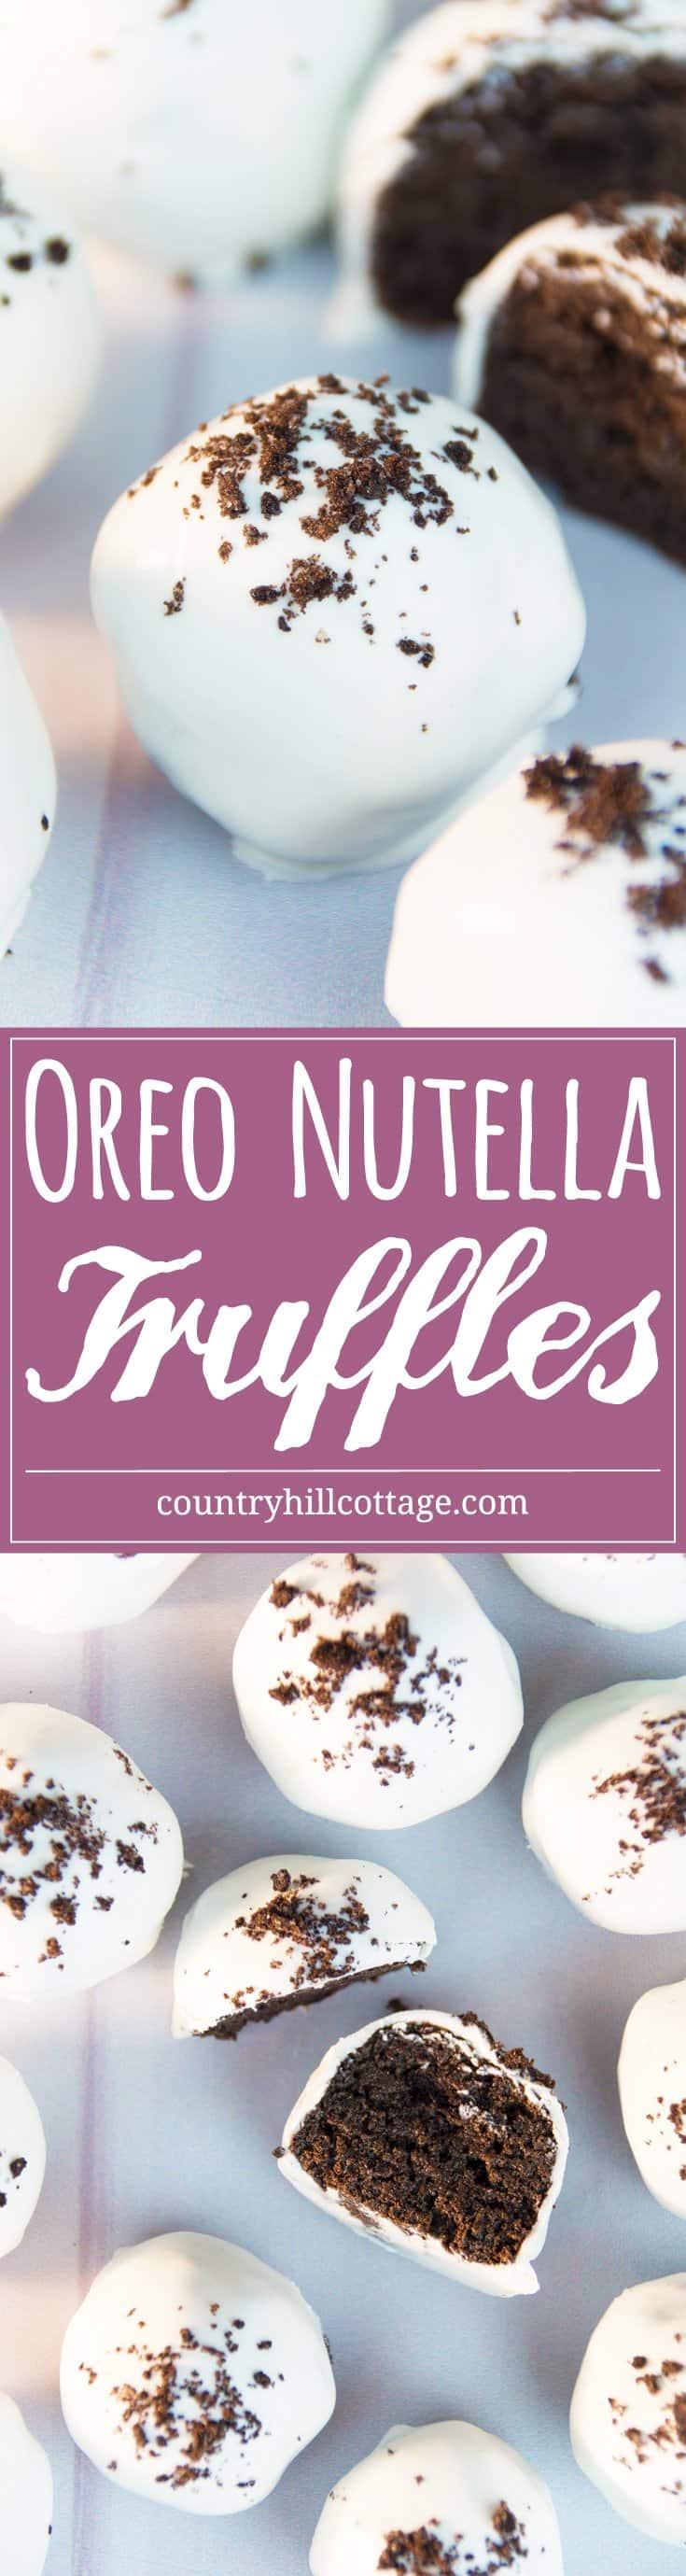 Learn to make no-bake Oreo Nutella bat bites with only 3 ingredients! #nobake #oreobites #Halloween | countryhillcottage.com